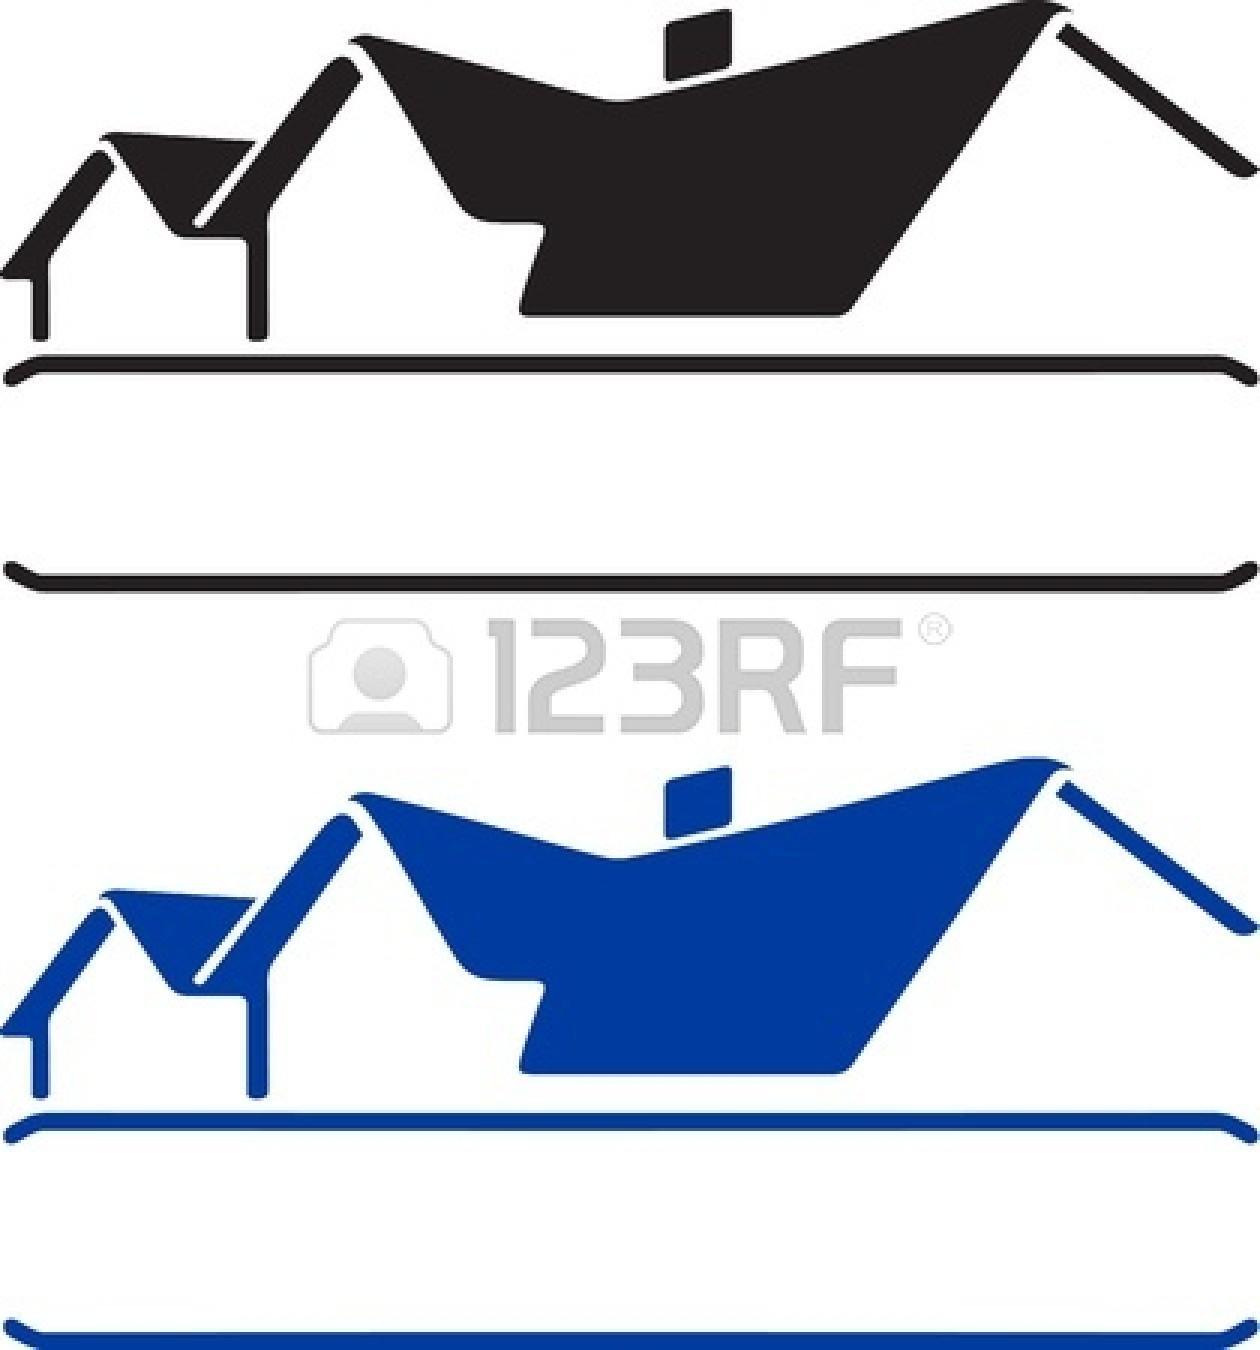 Roofline logo clipart.